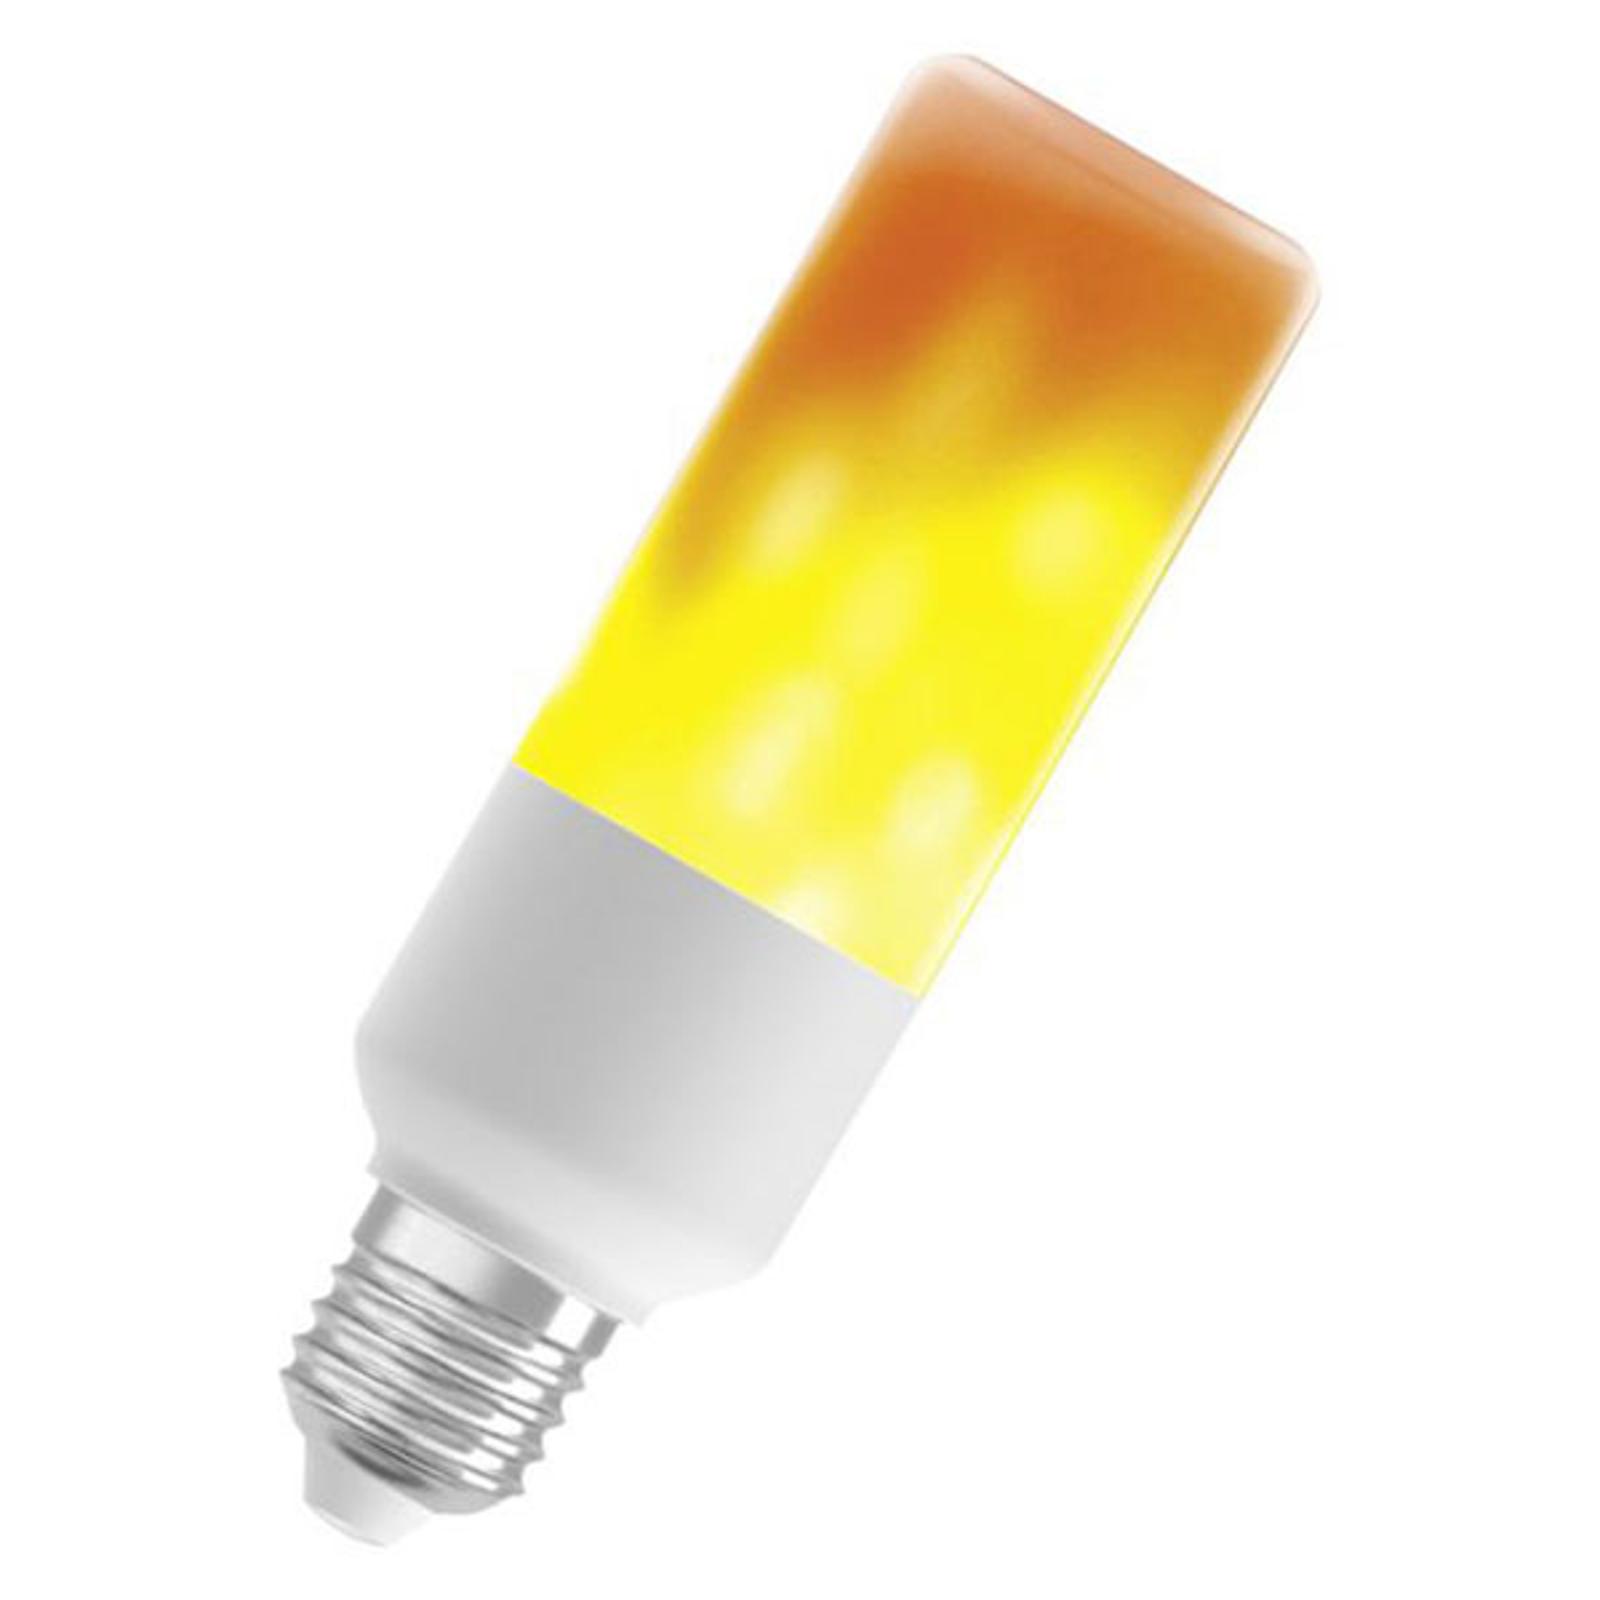 OSRAM Stick Flame żarówka LED E27 0,5W 1500K